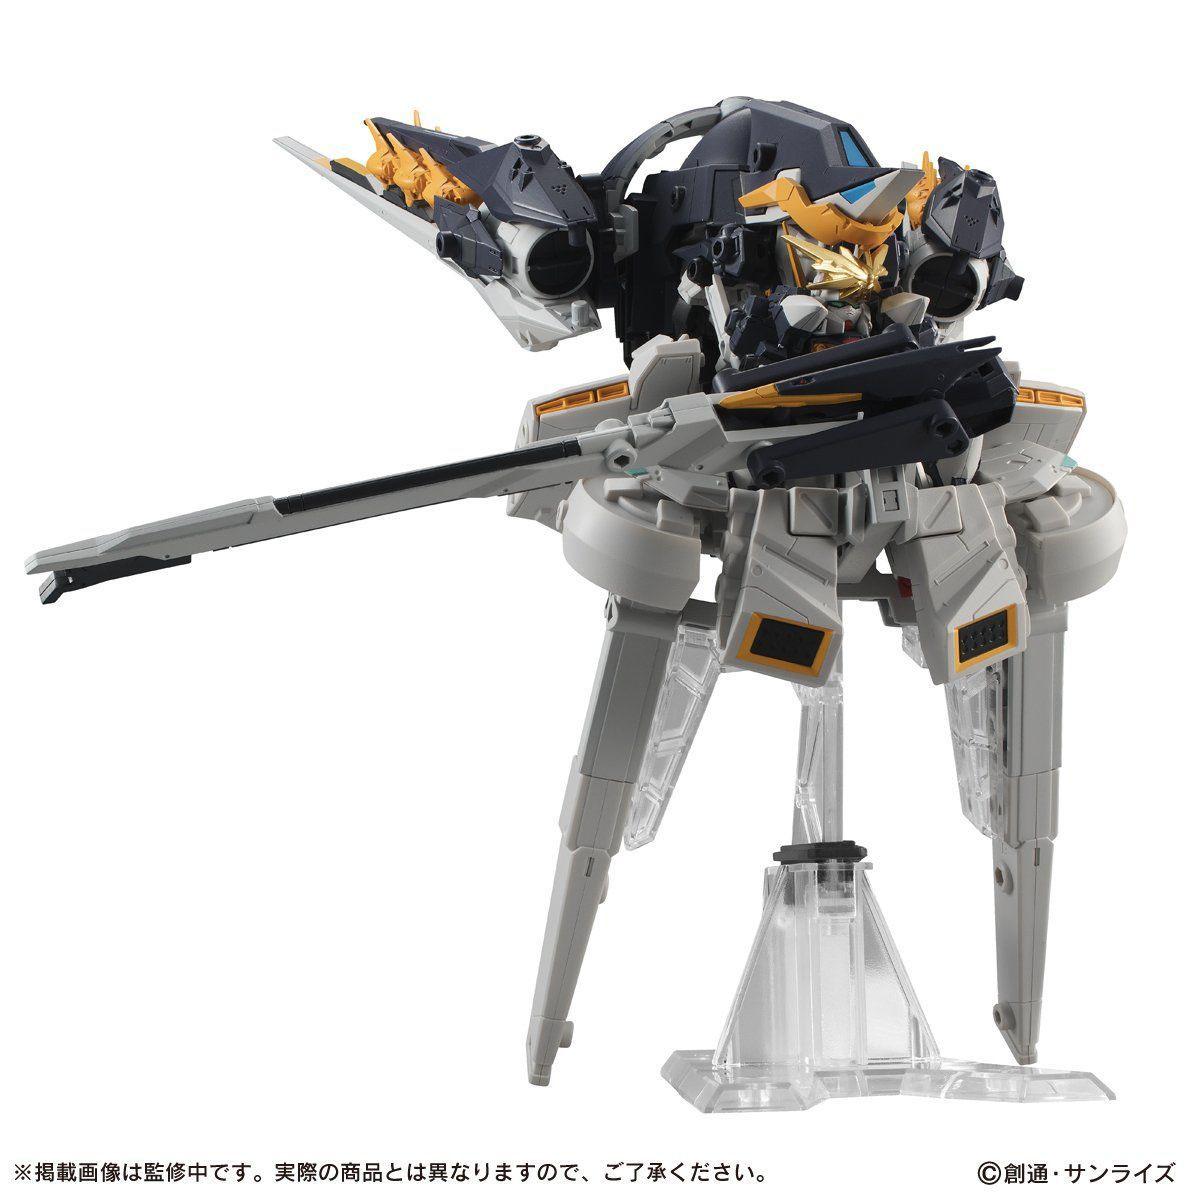 MOBILE SUIT ENSEMBLE EX09『TR-6 インレ』デフォルメ・フィギュア-001